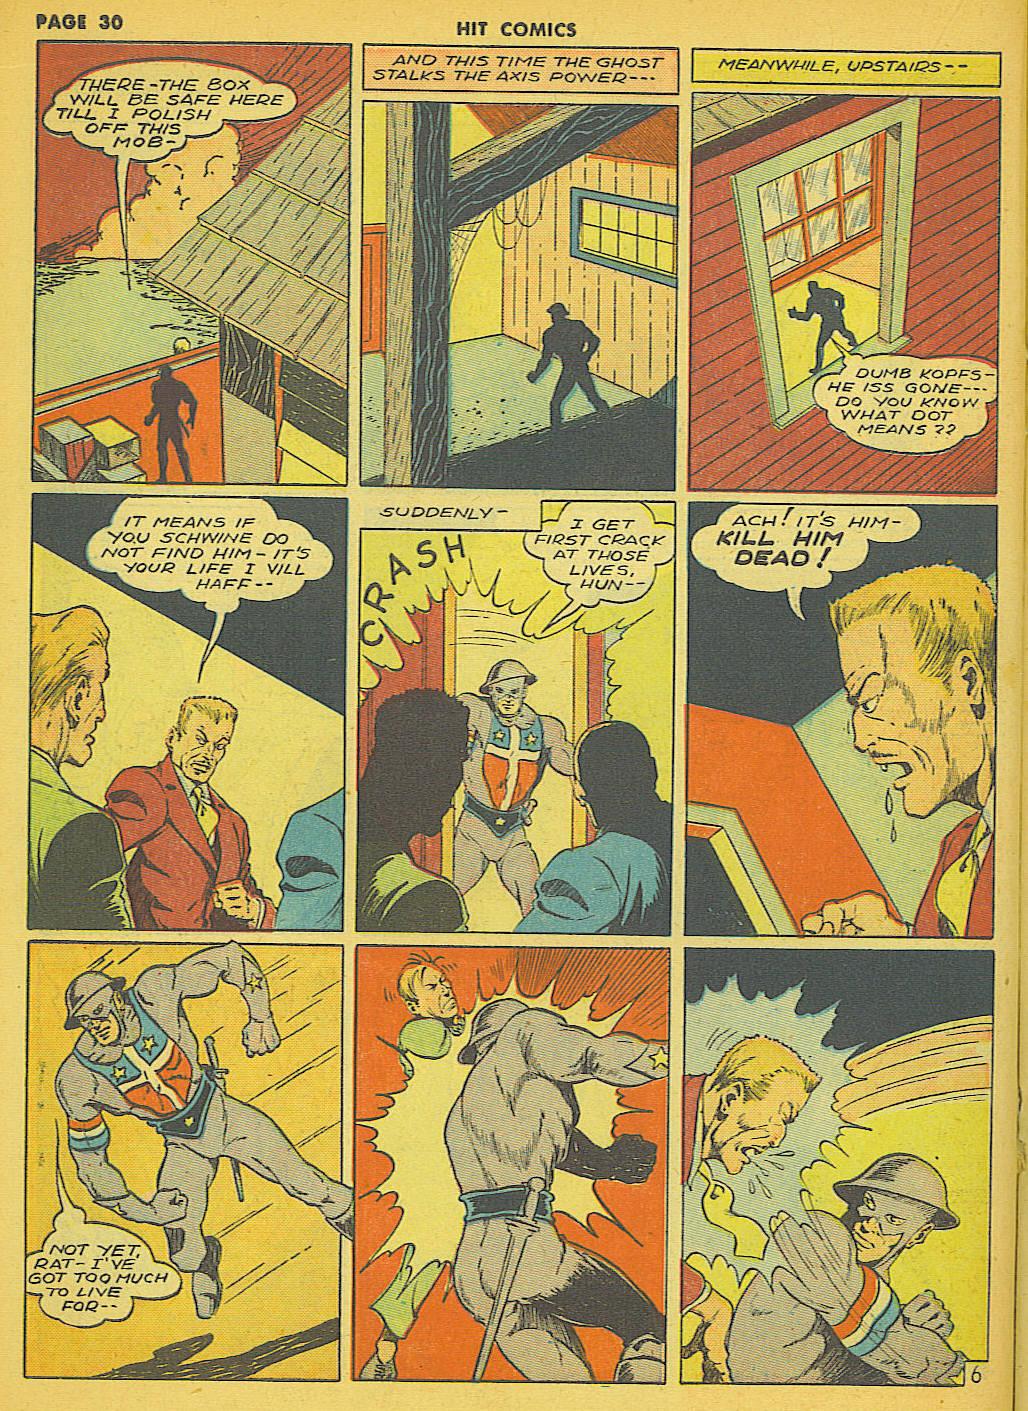 Read online Hit Comics comic -  Issue #21 - 32